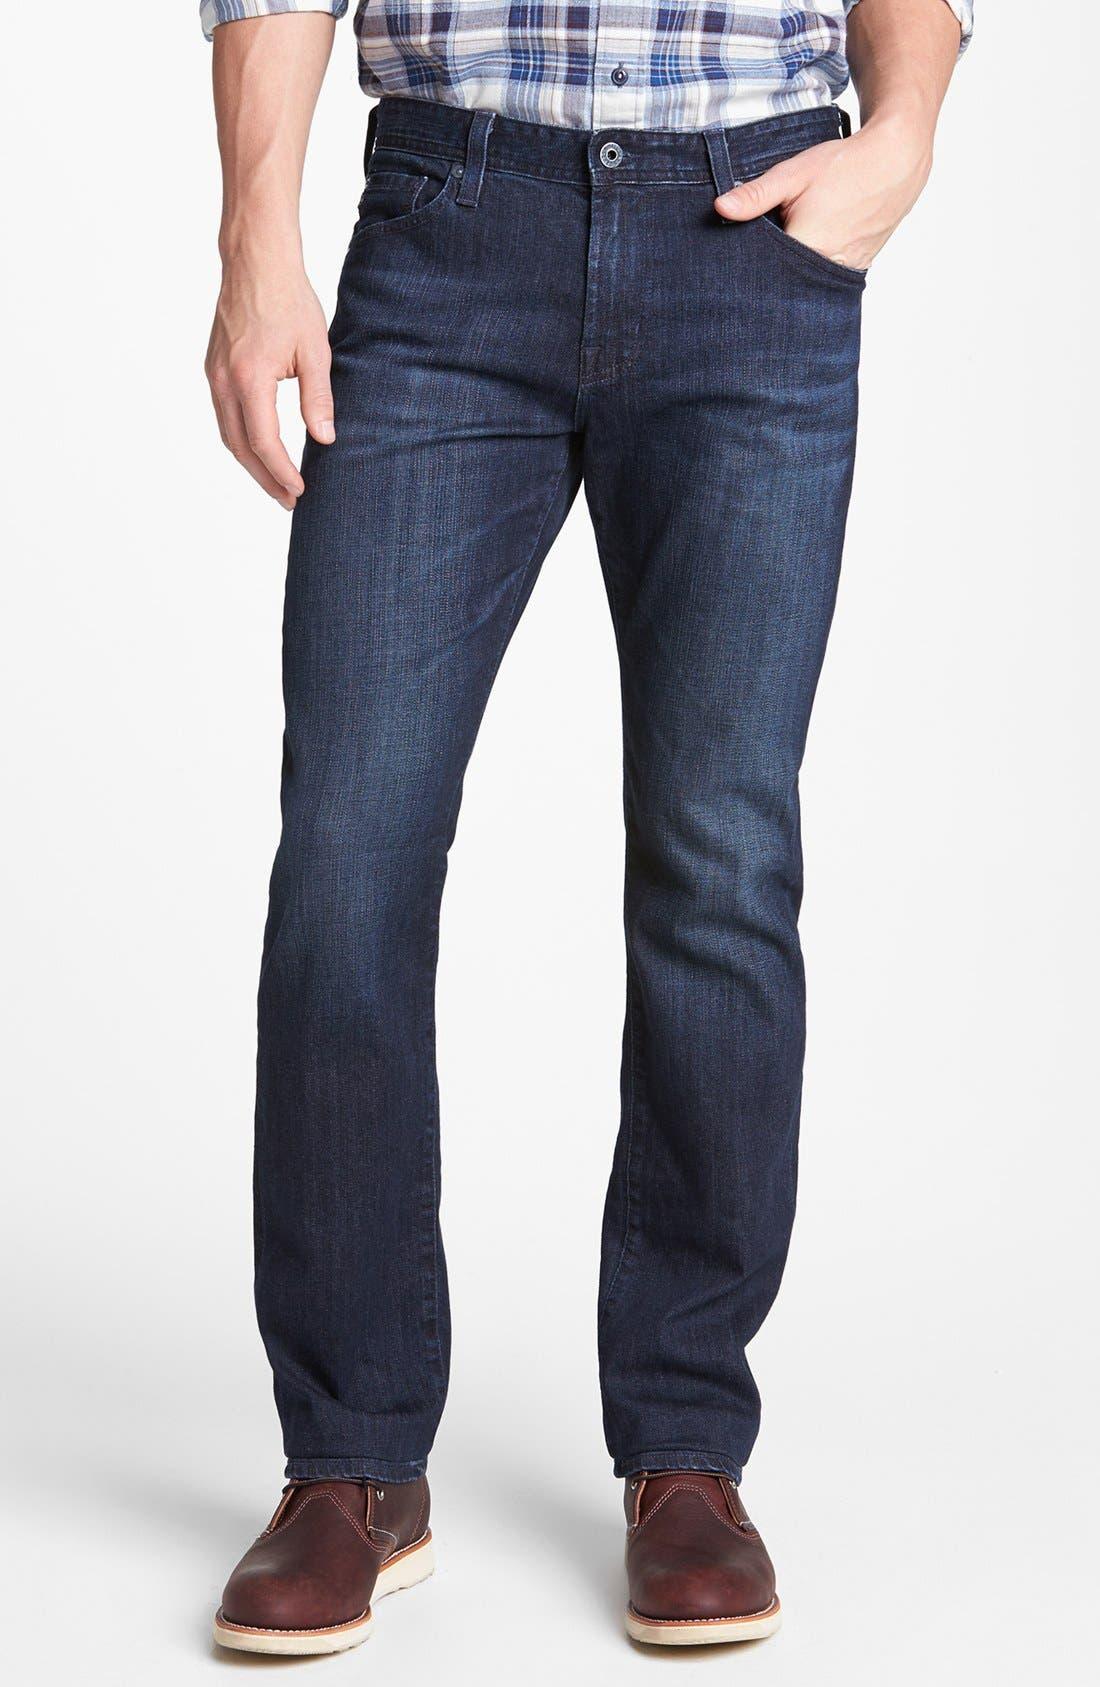 Alternate Image 1 Selected - John W. Nordstrom® Cashmere V-Neck Argyle Sweater & AG Tailored Fit Straight Leg Jeans